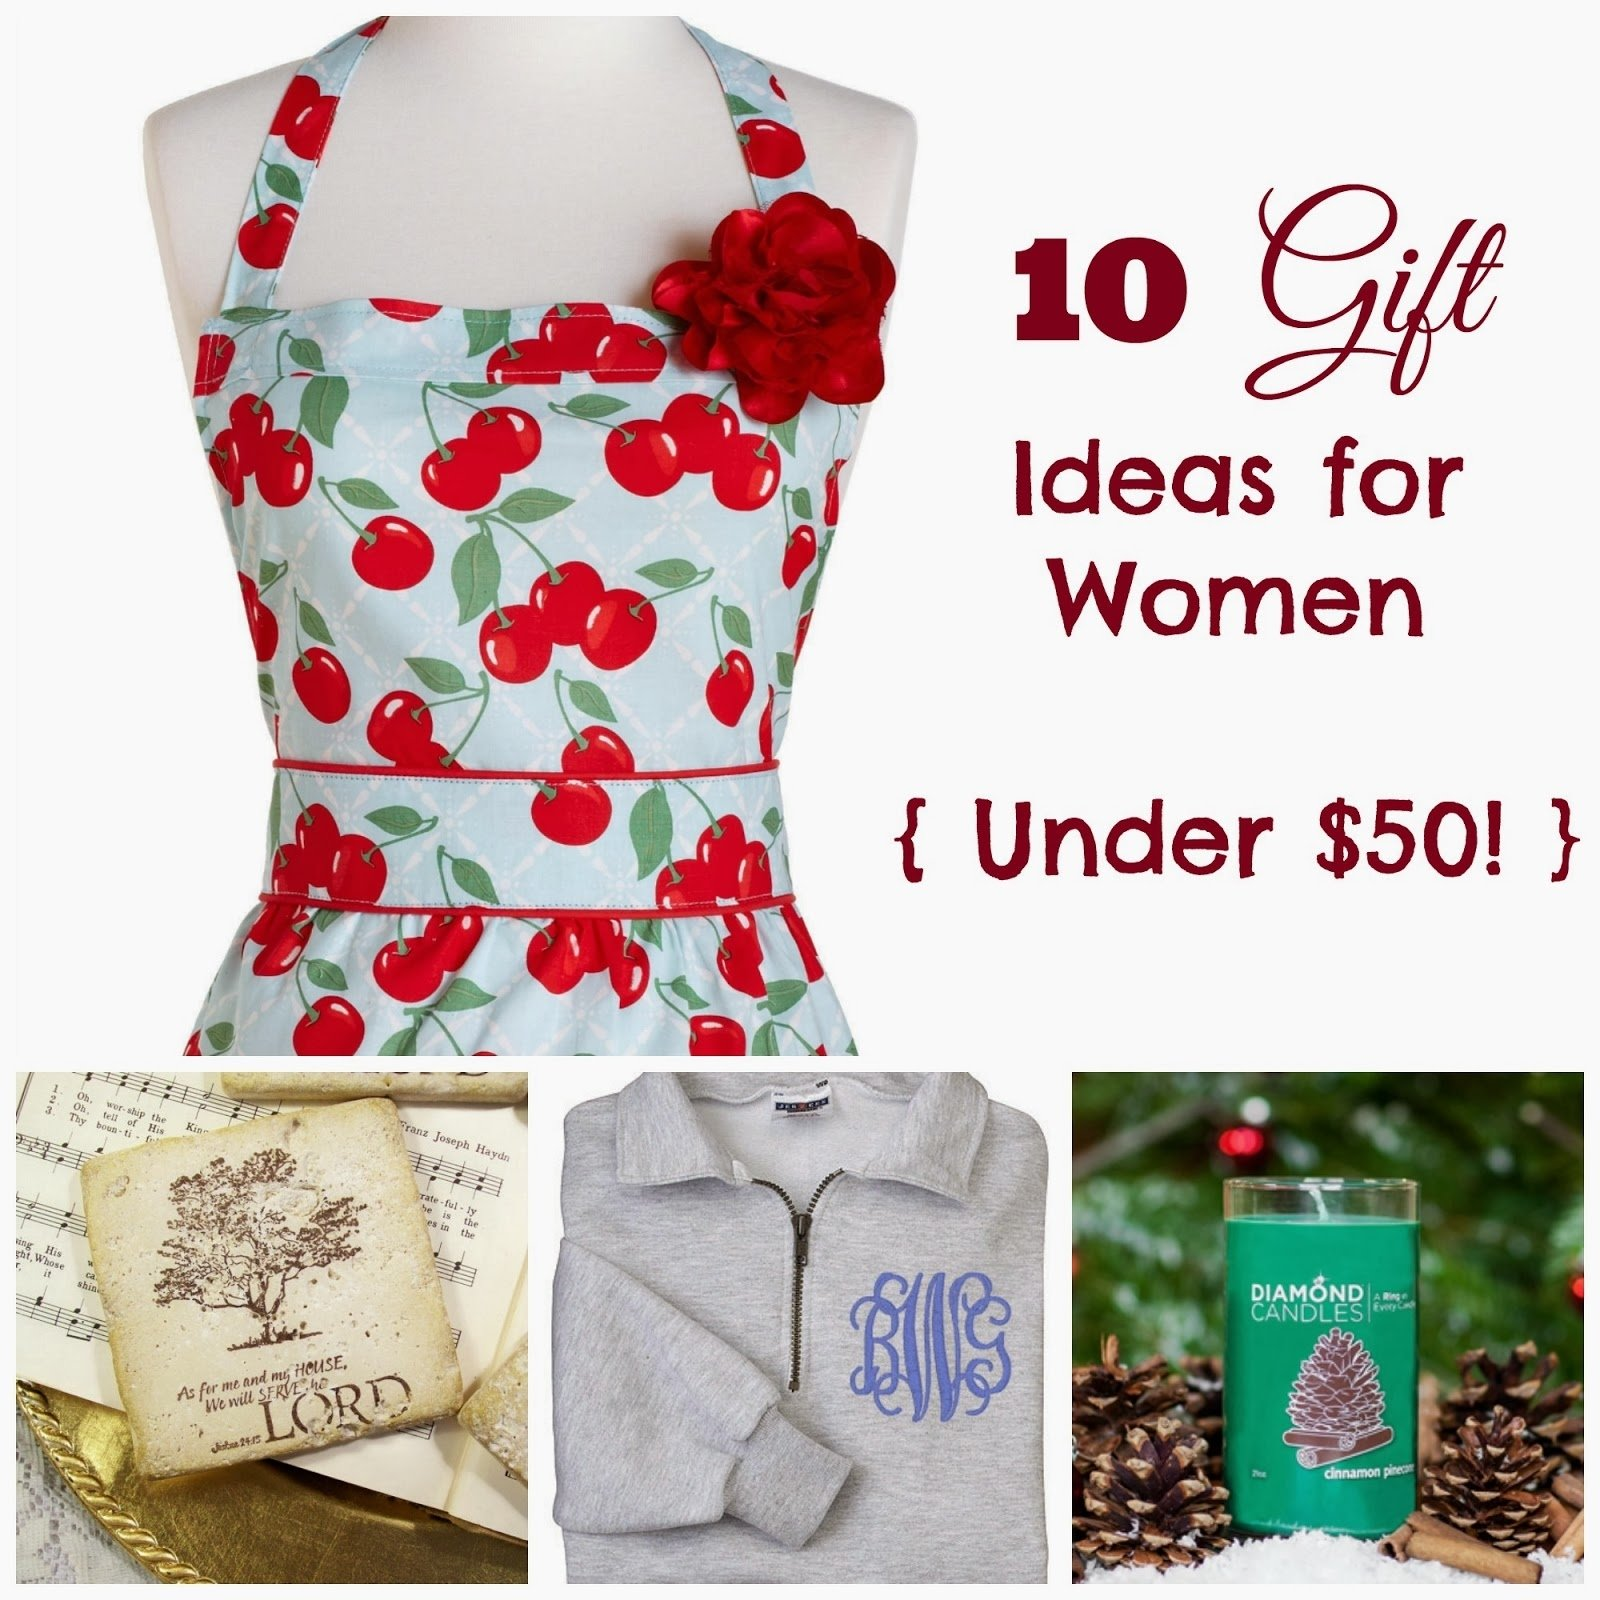 10 Great 2013 Gift Ideas For Women where joy is 10 gift ideas for women under 50